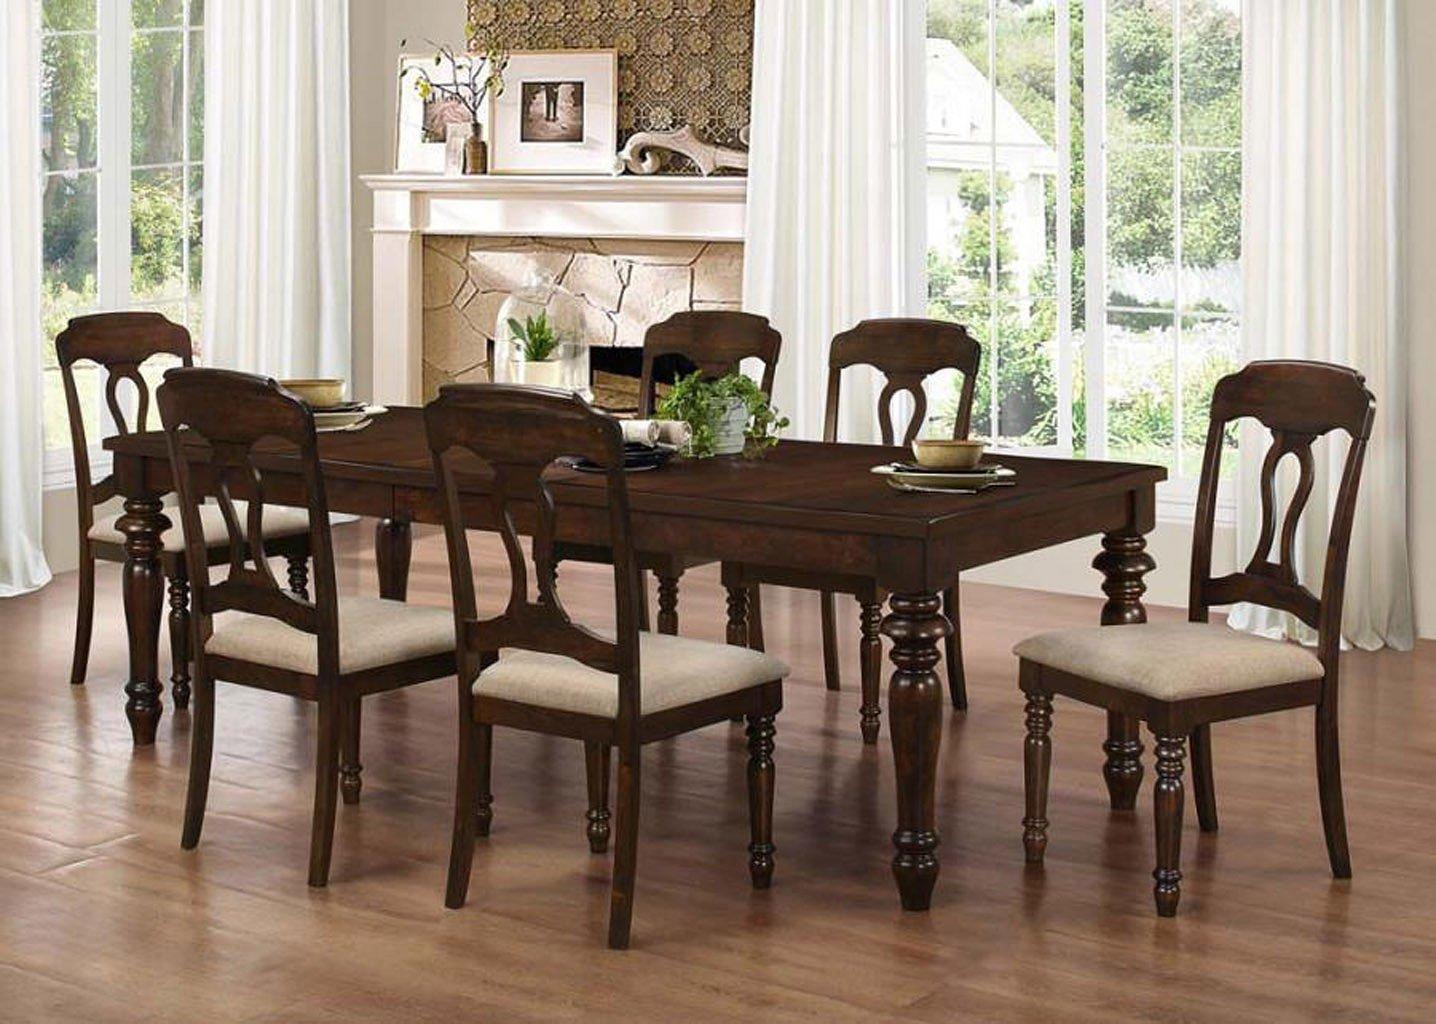 Hamilton Dining Room Set By Coaster Furniture